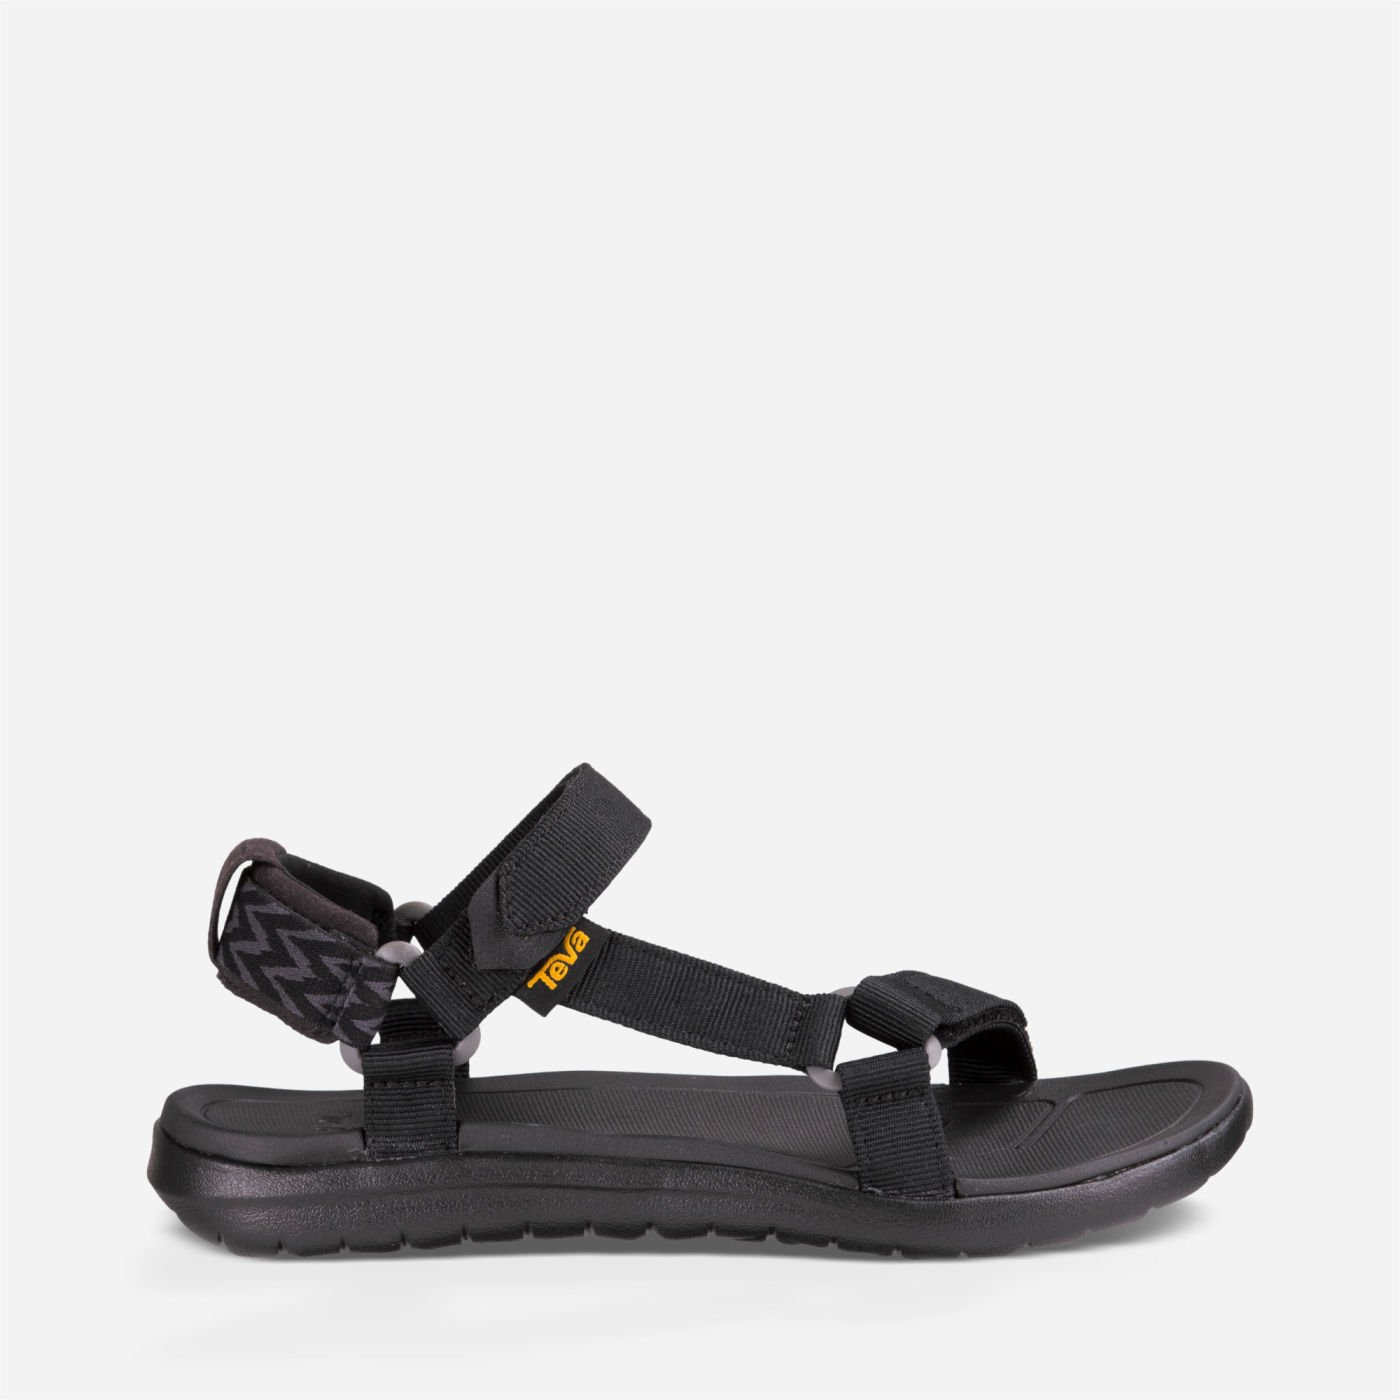 f1117e95e746 Dámské sandály Teva